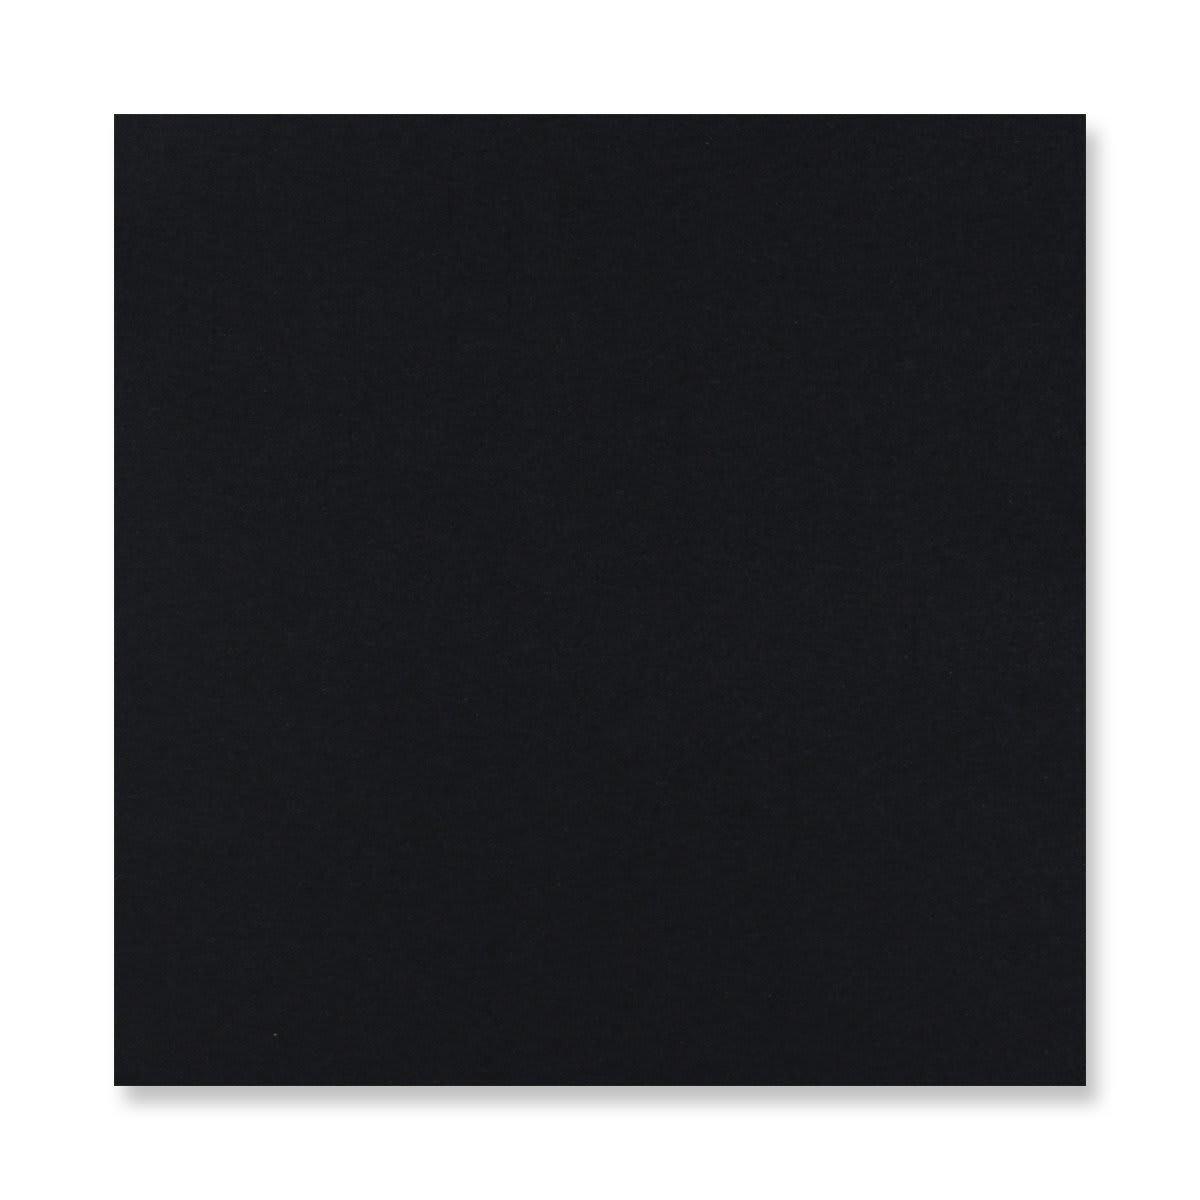 155 x 155MM BLACK V-FLAP PEEL AND SEAL ENVELOPES